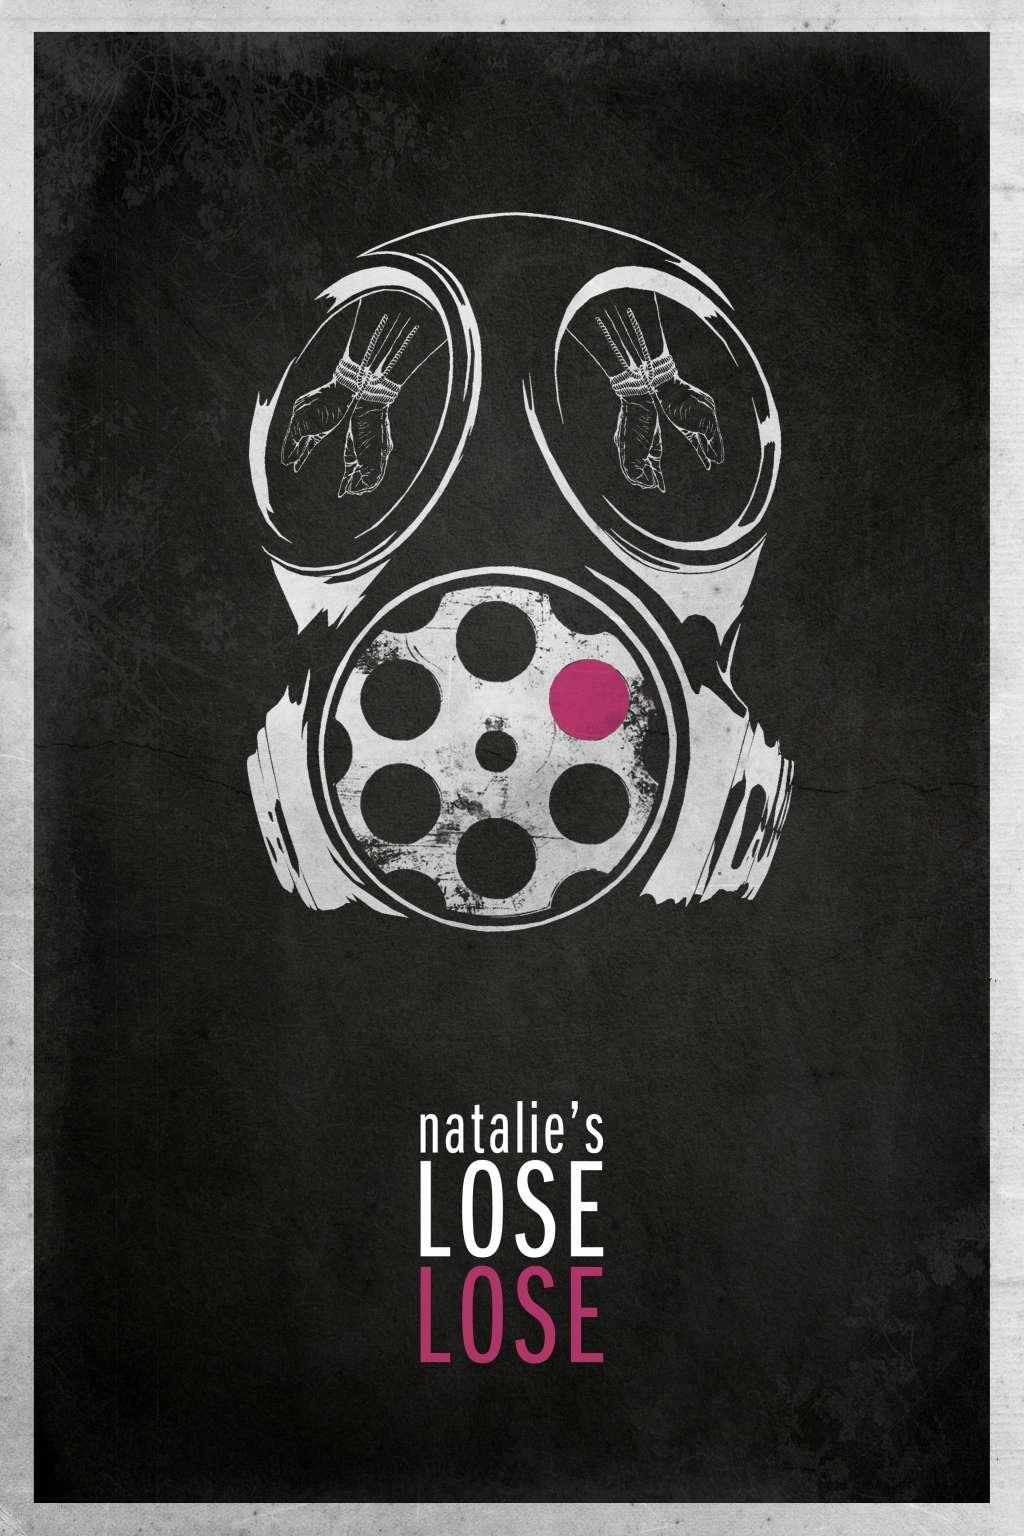 Natalie's Lose Lose kapak